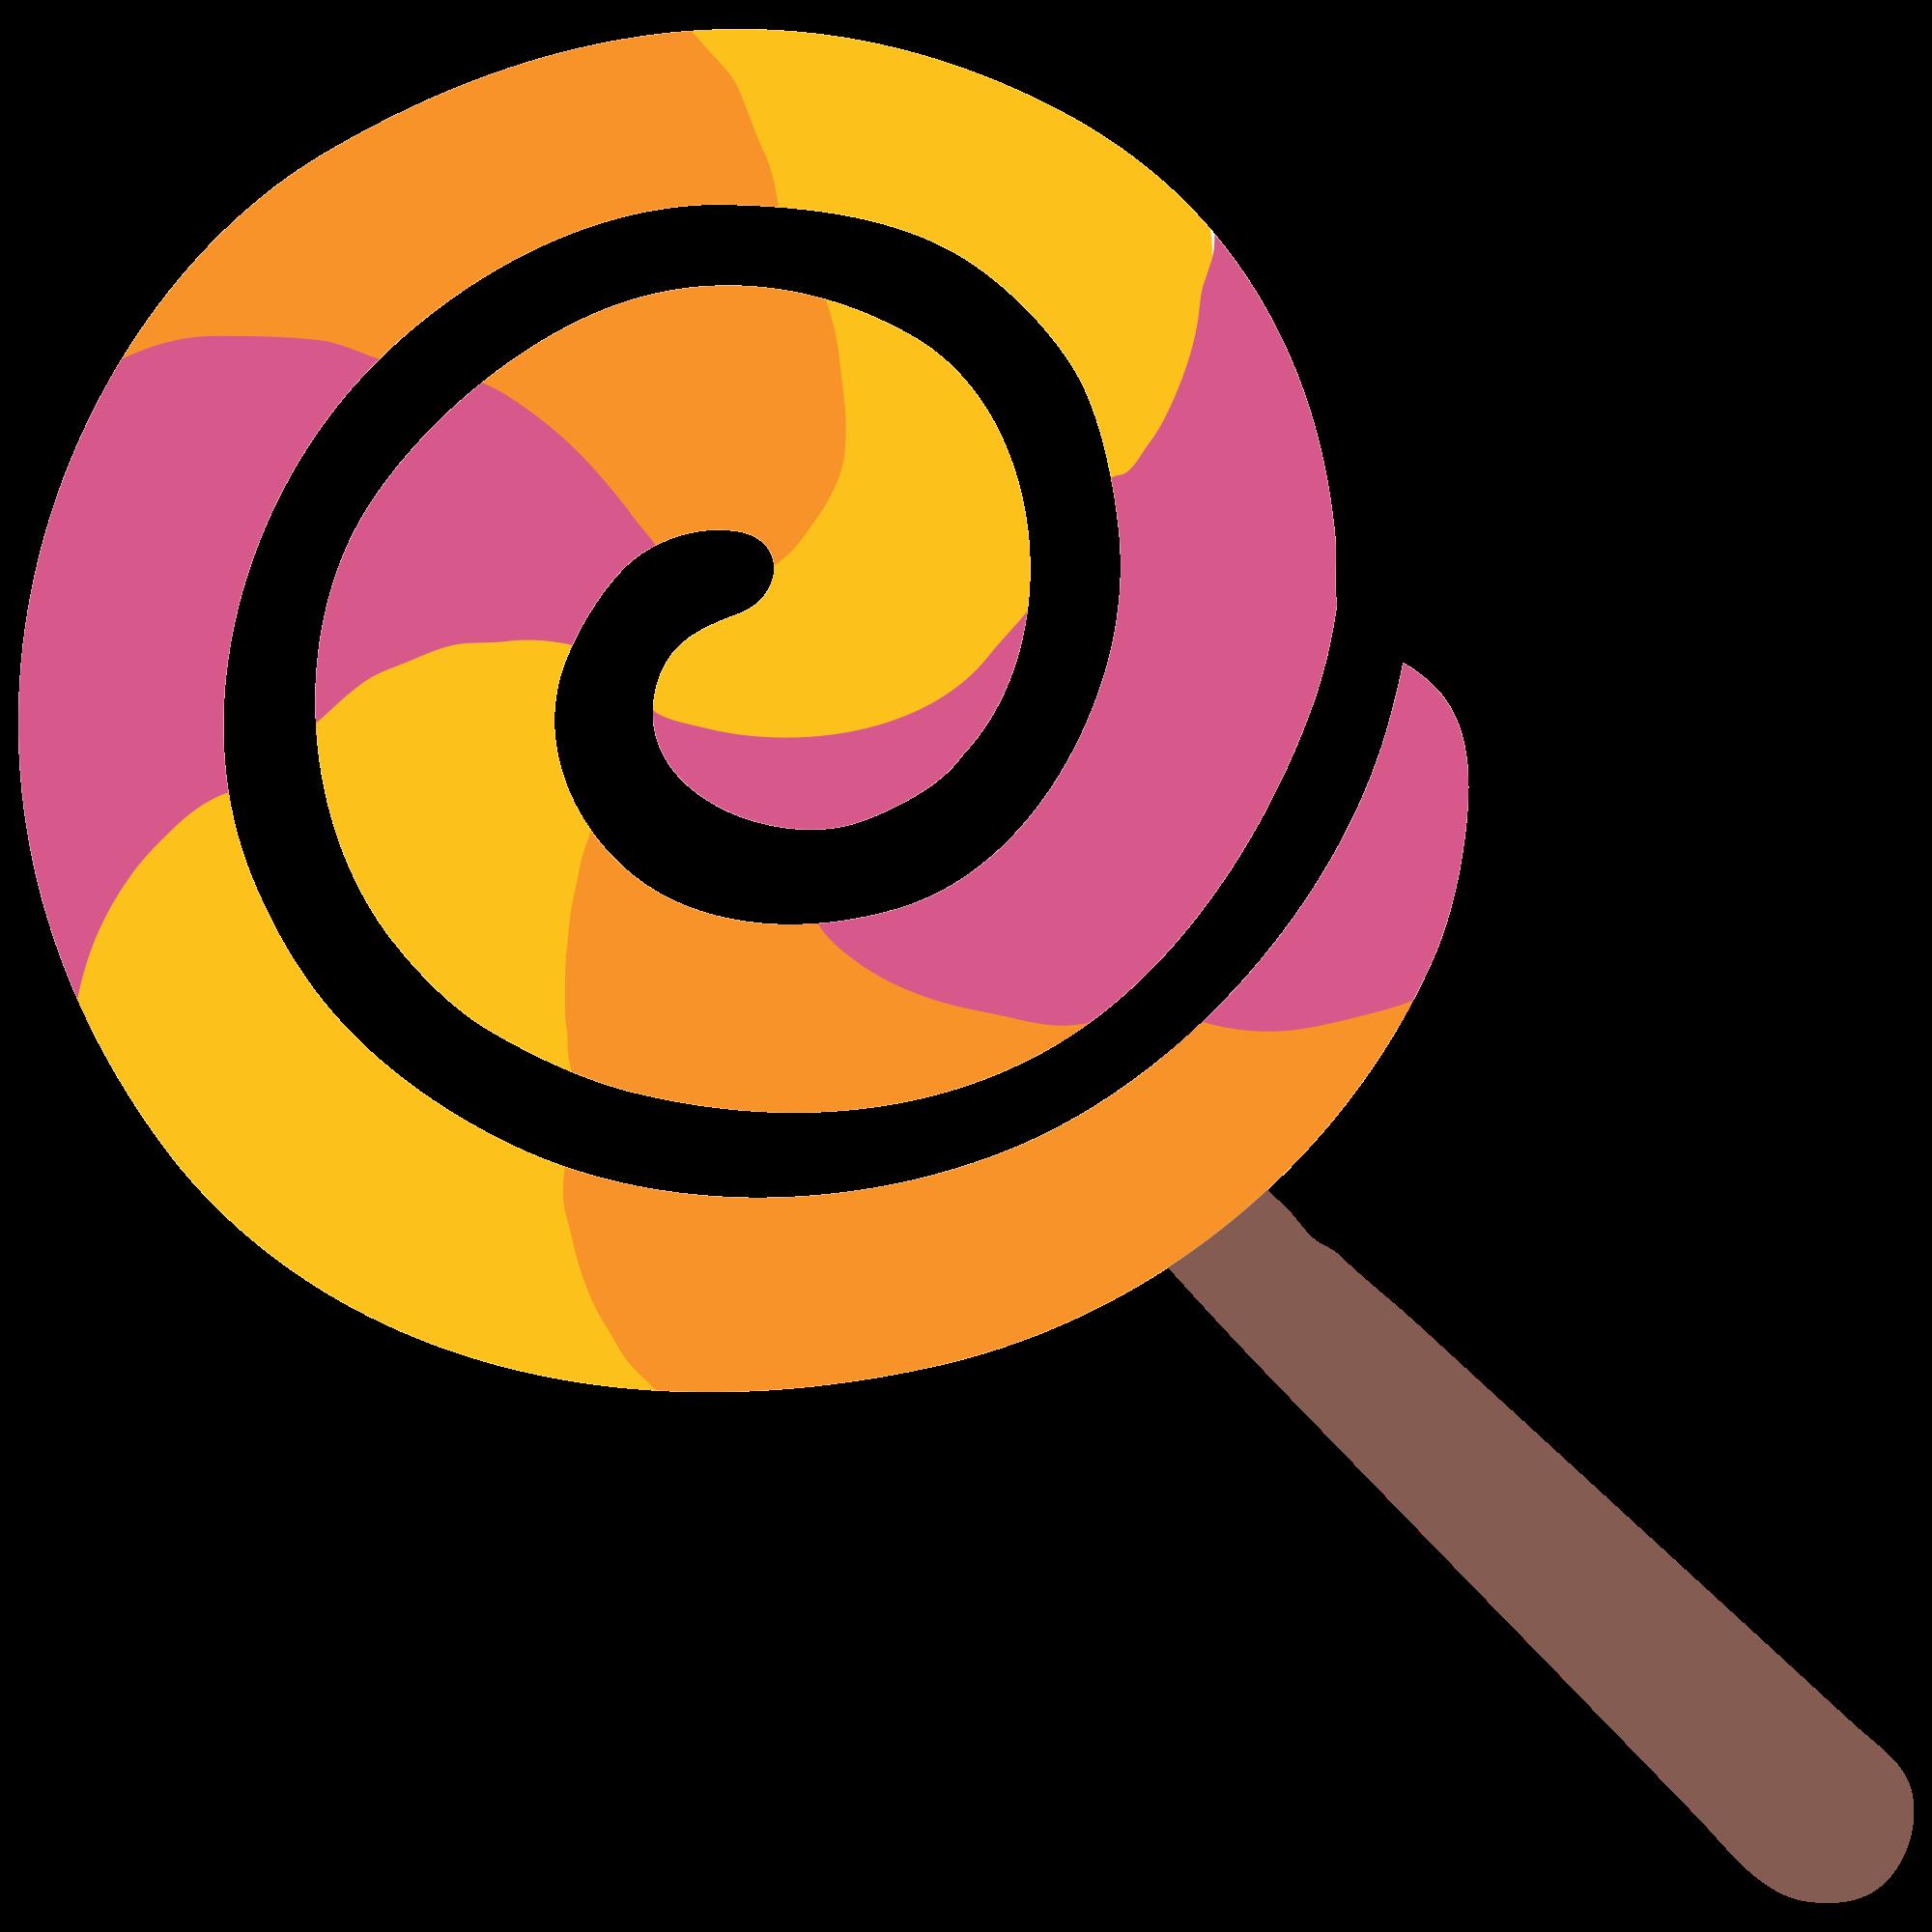 Lollipop svg #20, Download drawings